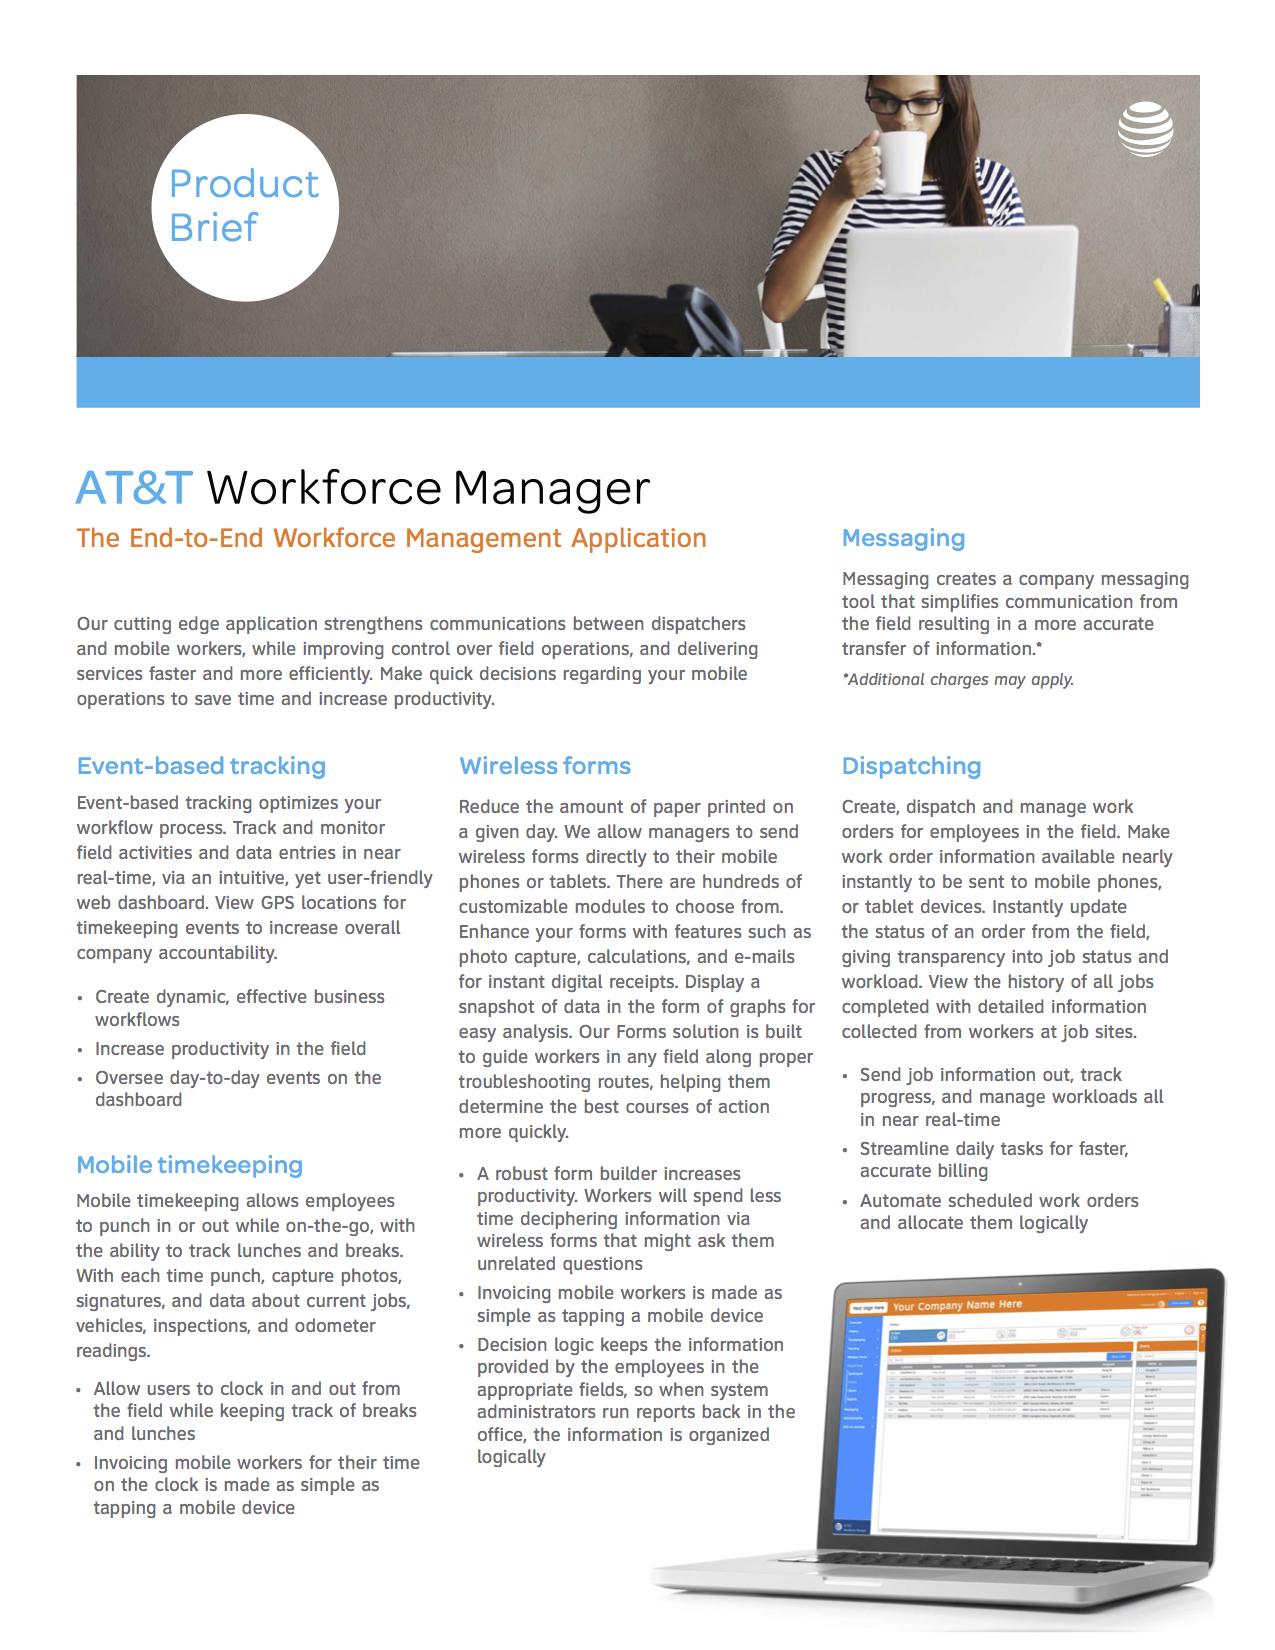 att-workforce-manager-p1.jpg